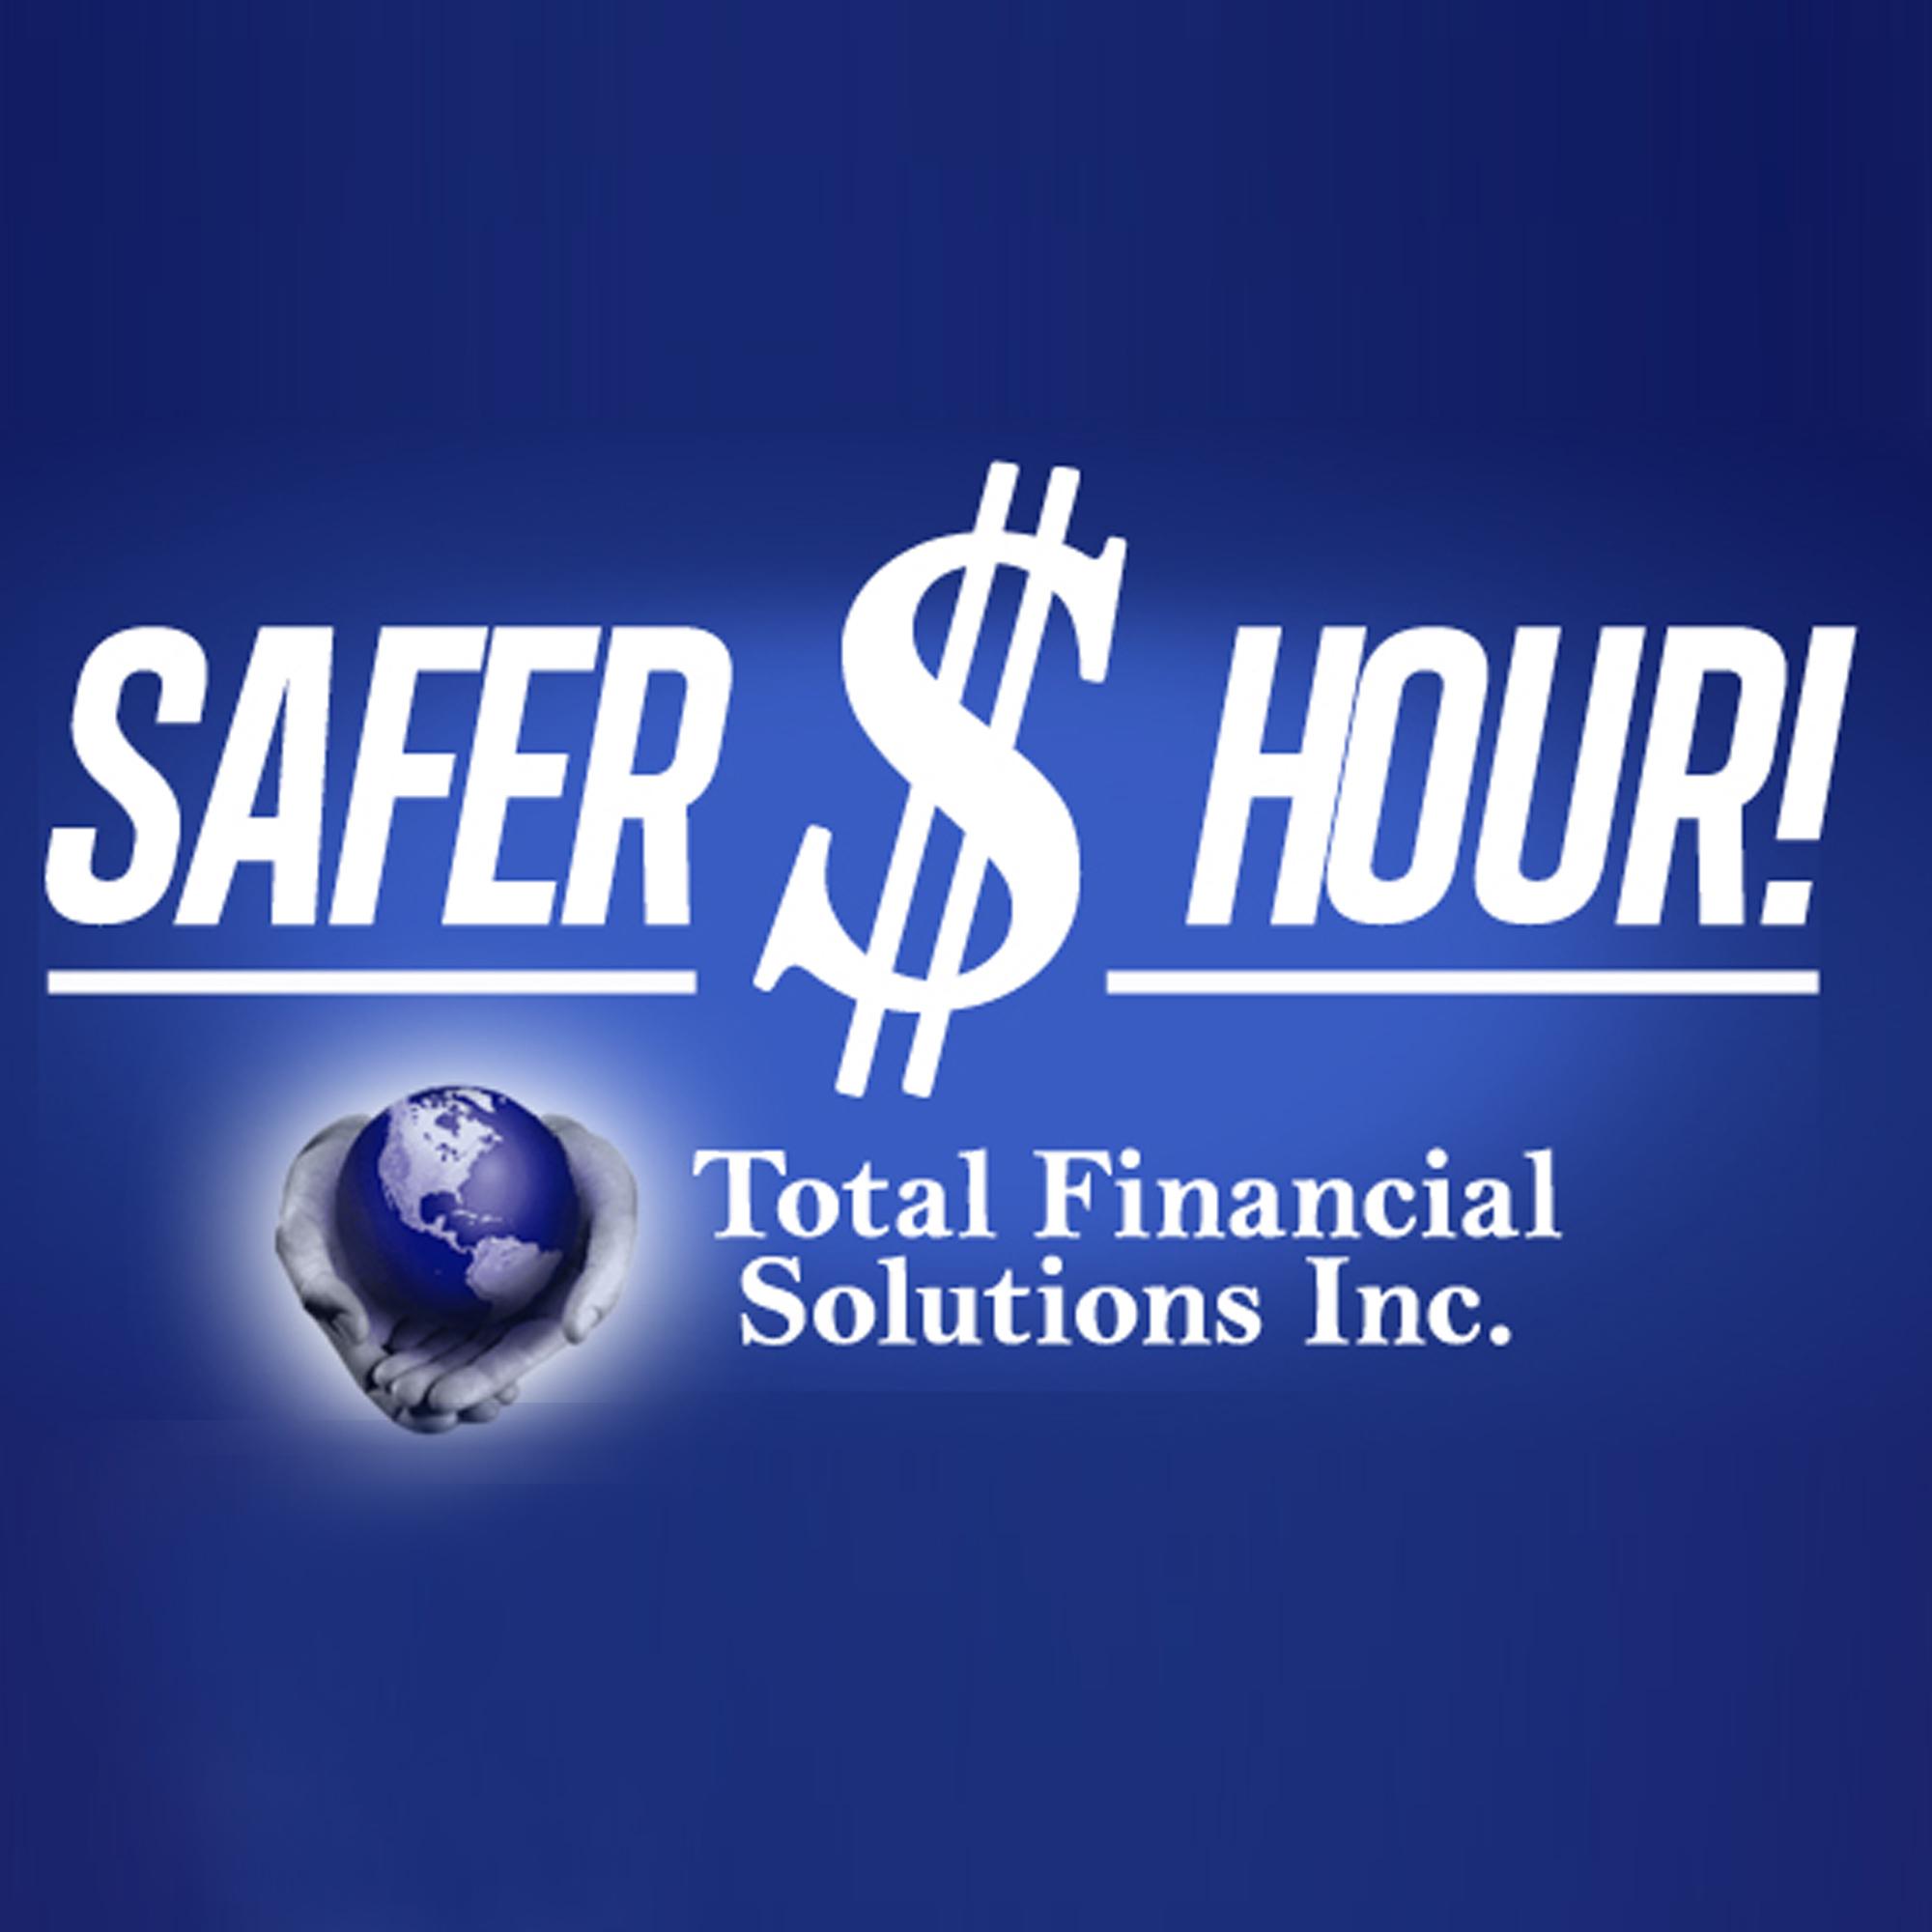 Total Financial Safer Money Hour